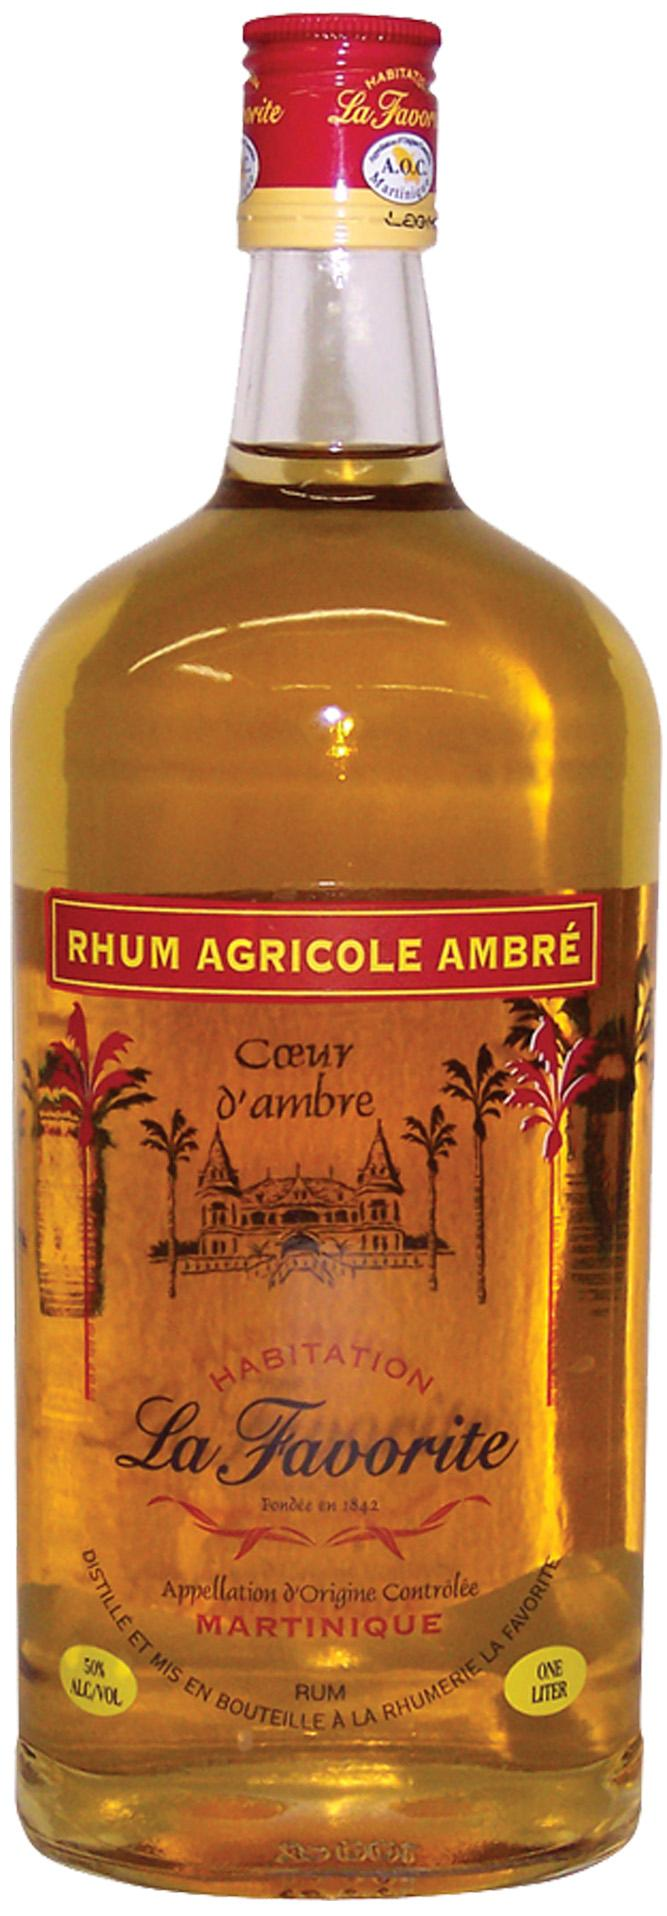 la favorite rhum agricole ambre.jpg